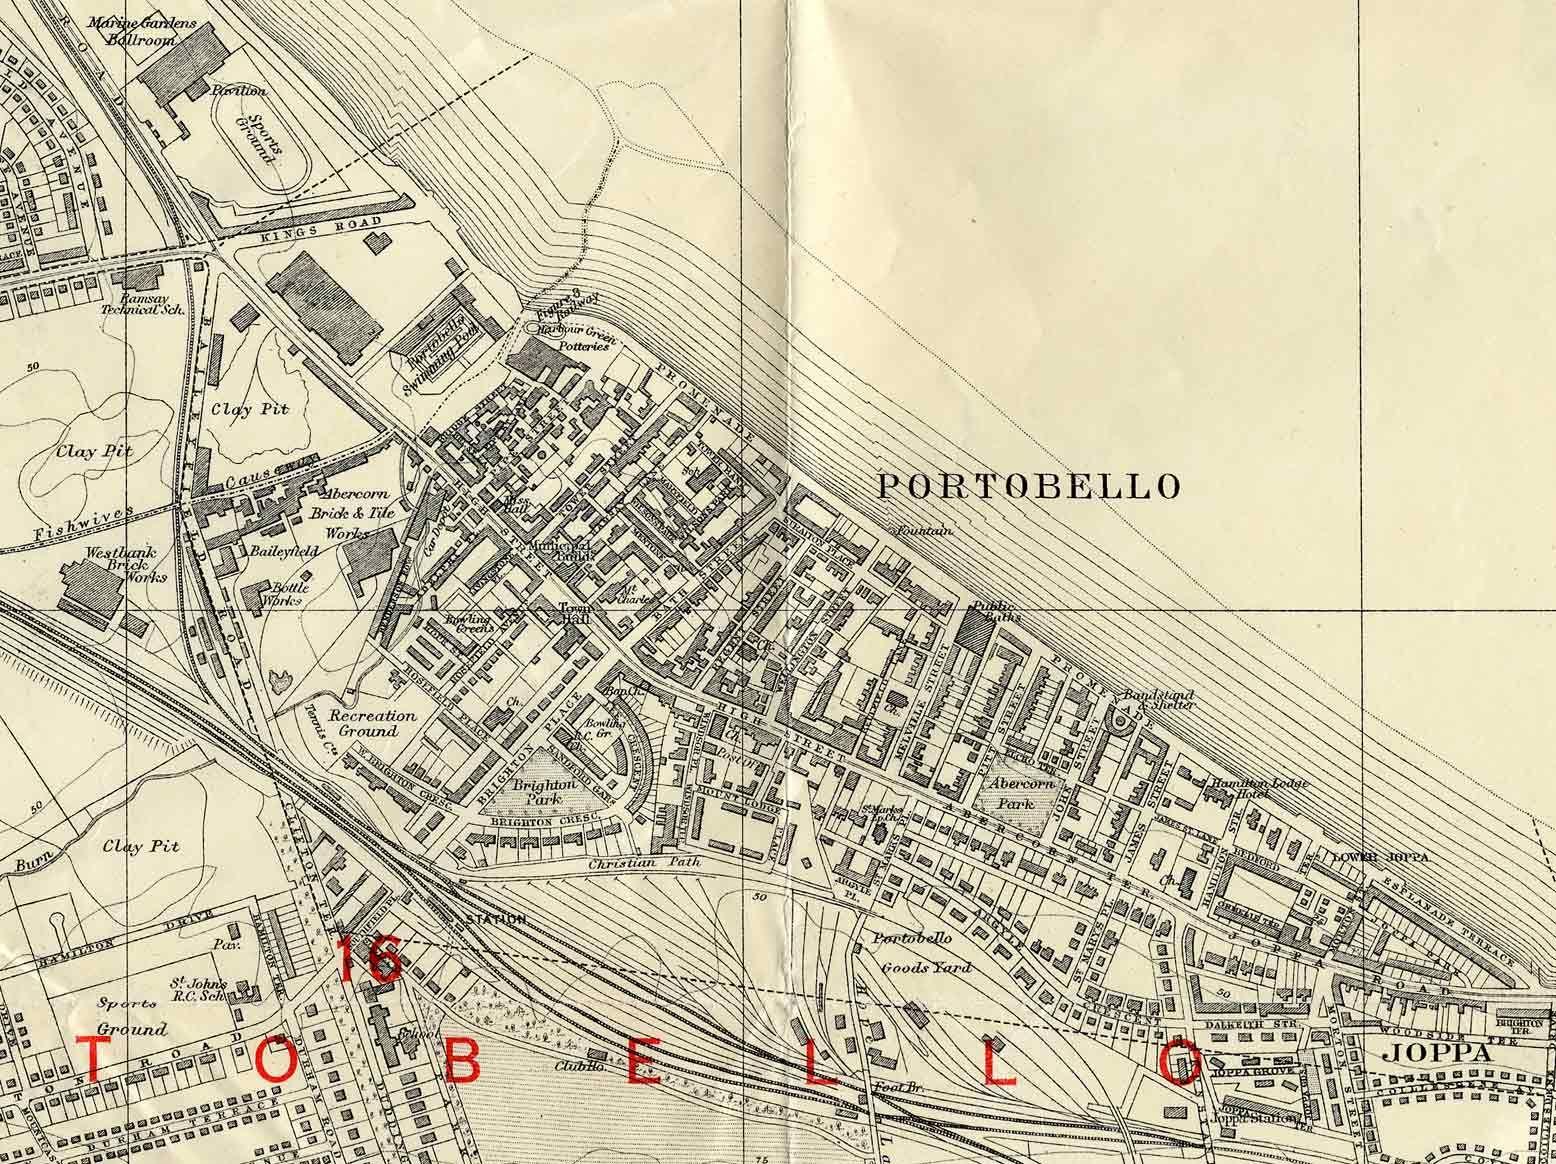 Leith Scotland Map.Edinburgh And Leith Map 1940 Portobello Section My Childhood